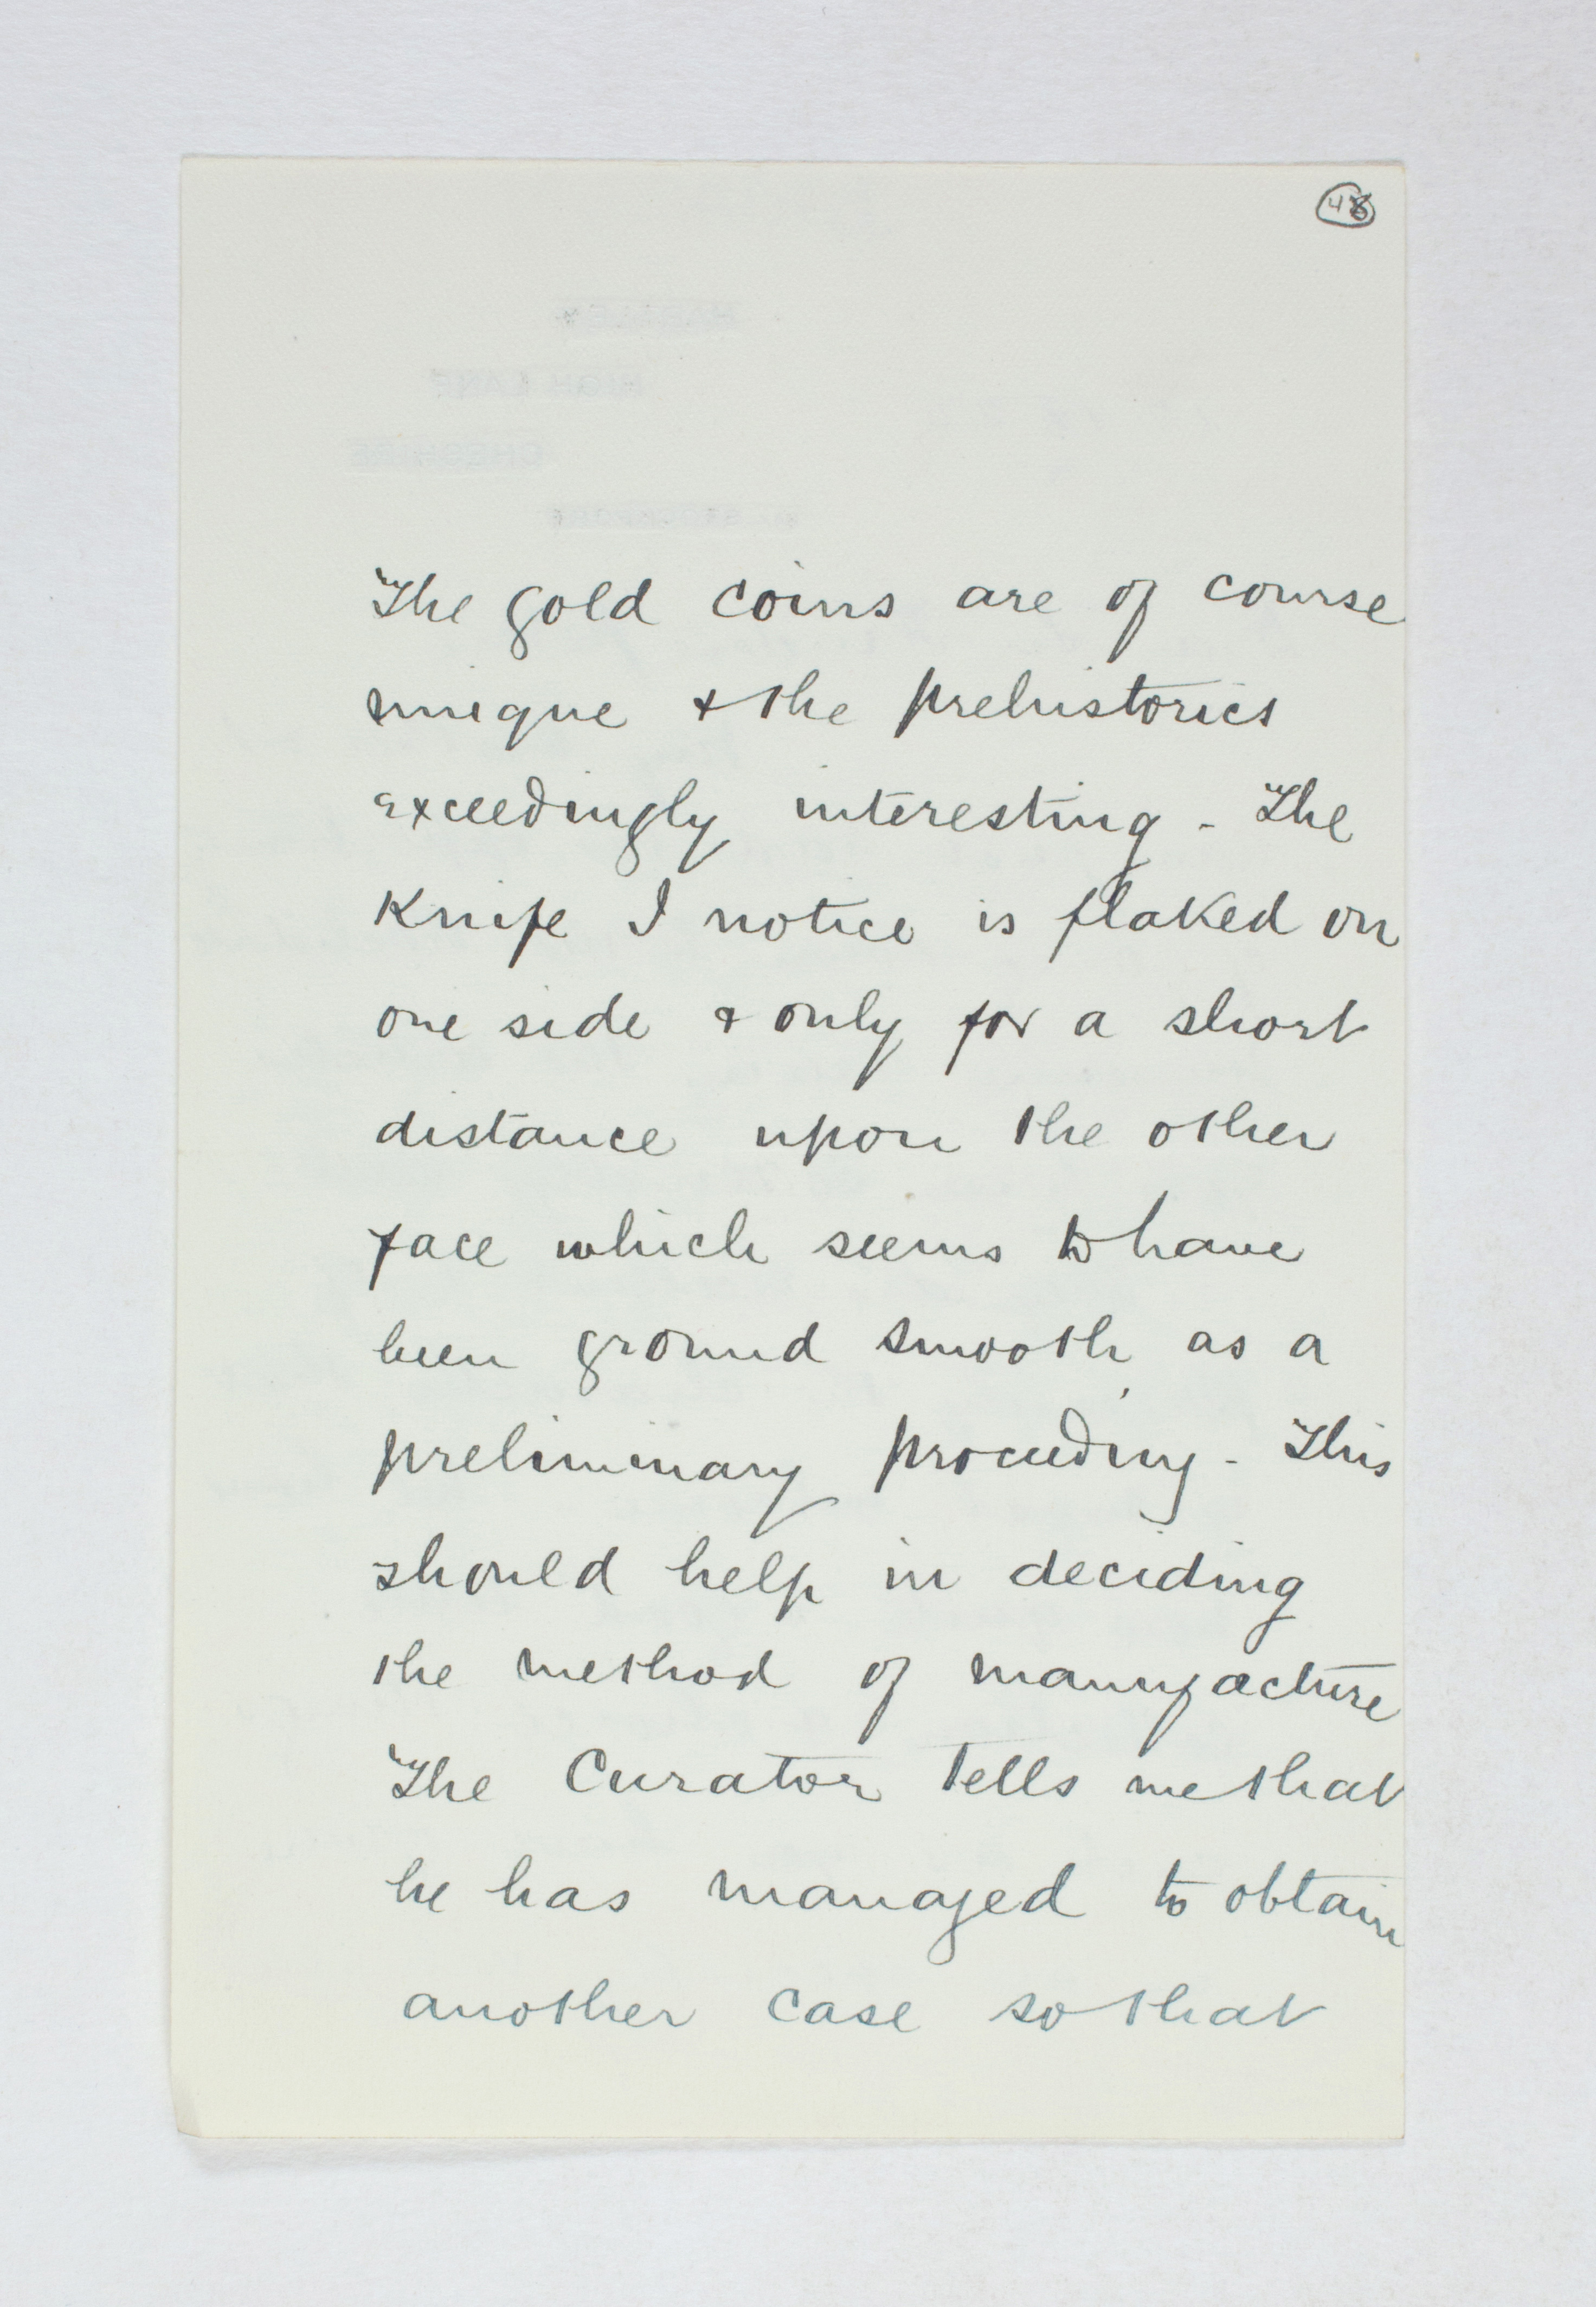 1922-23 Qau el-Kebir Correspondence PMA/WFP1/D/26/48.2